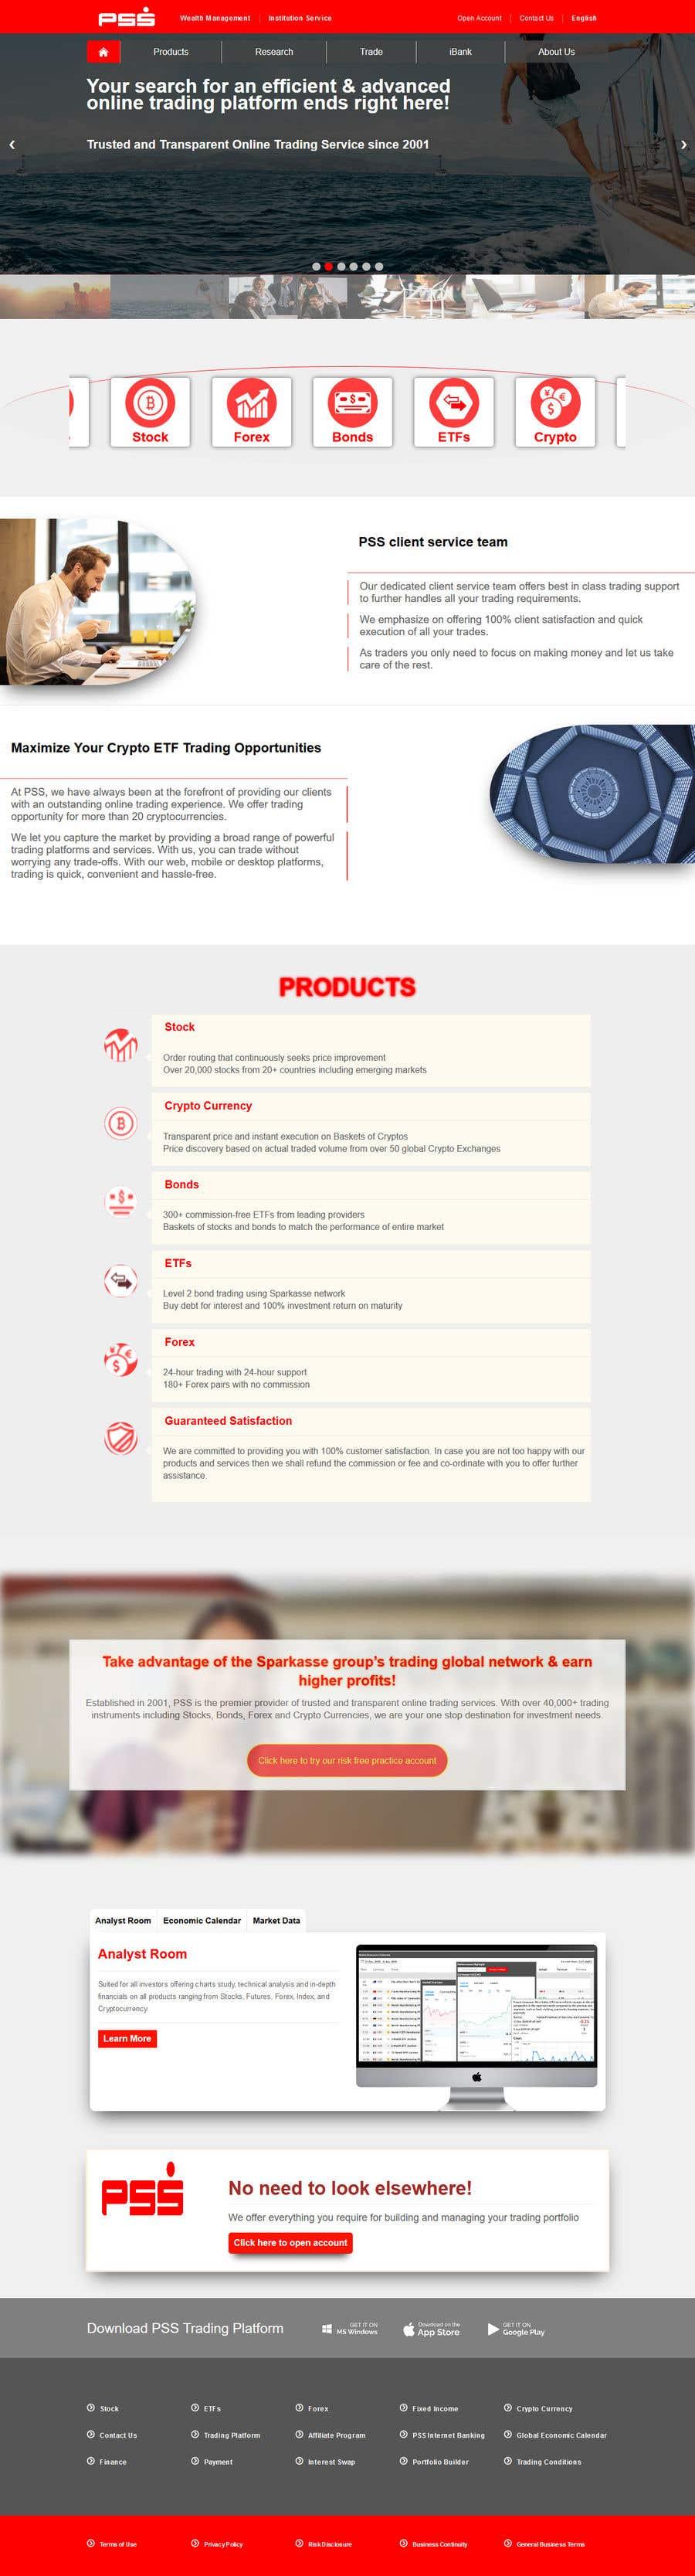 "Intrarea #19 pentru concursul ""Home page design for existing site"""